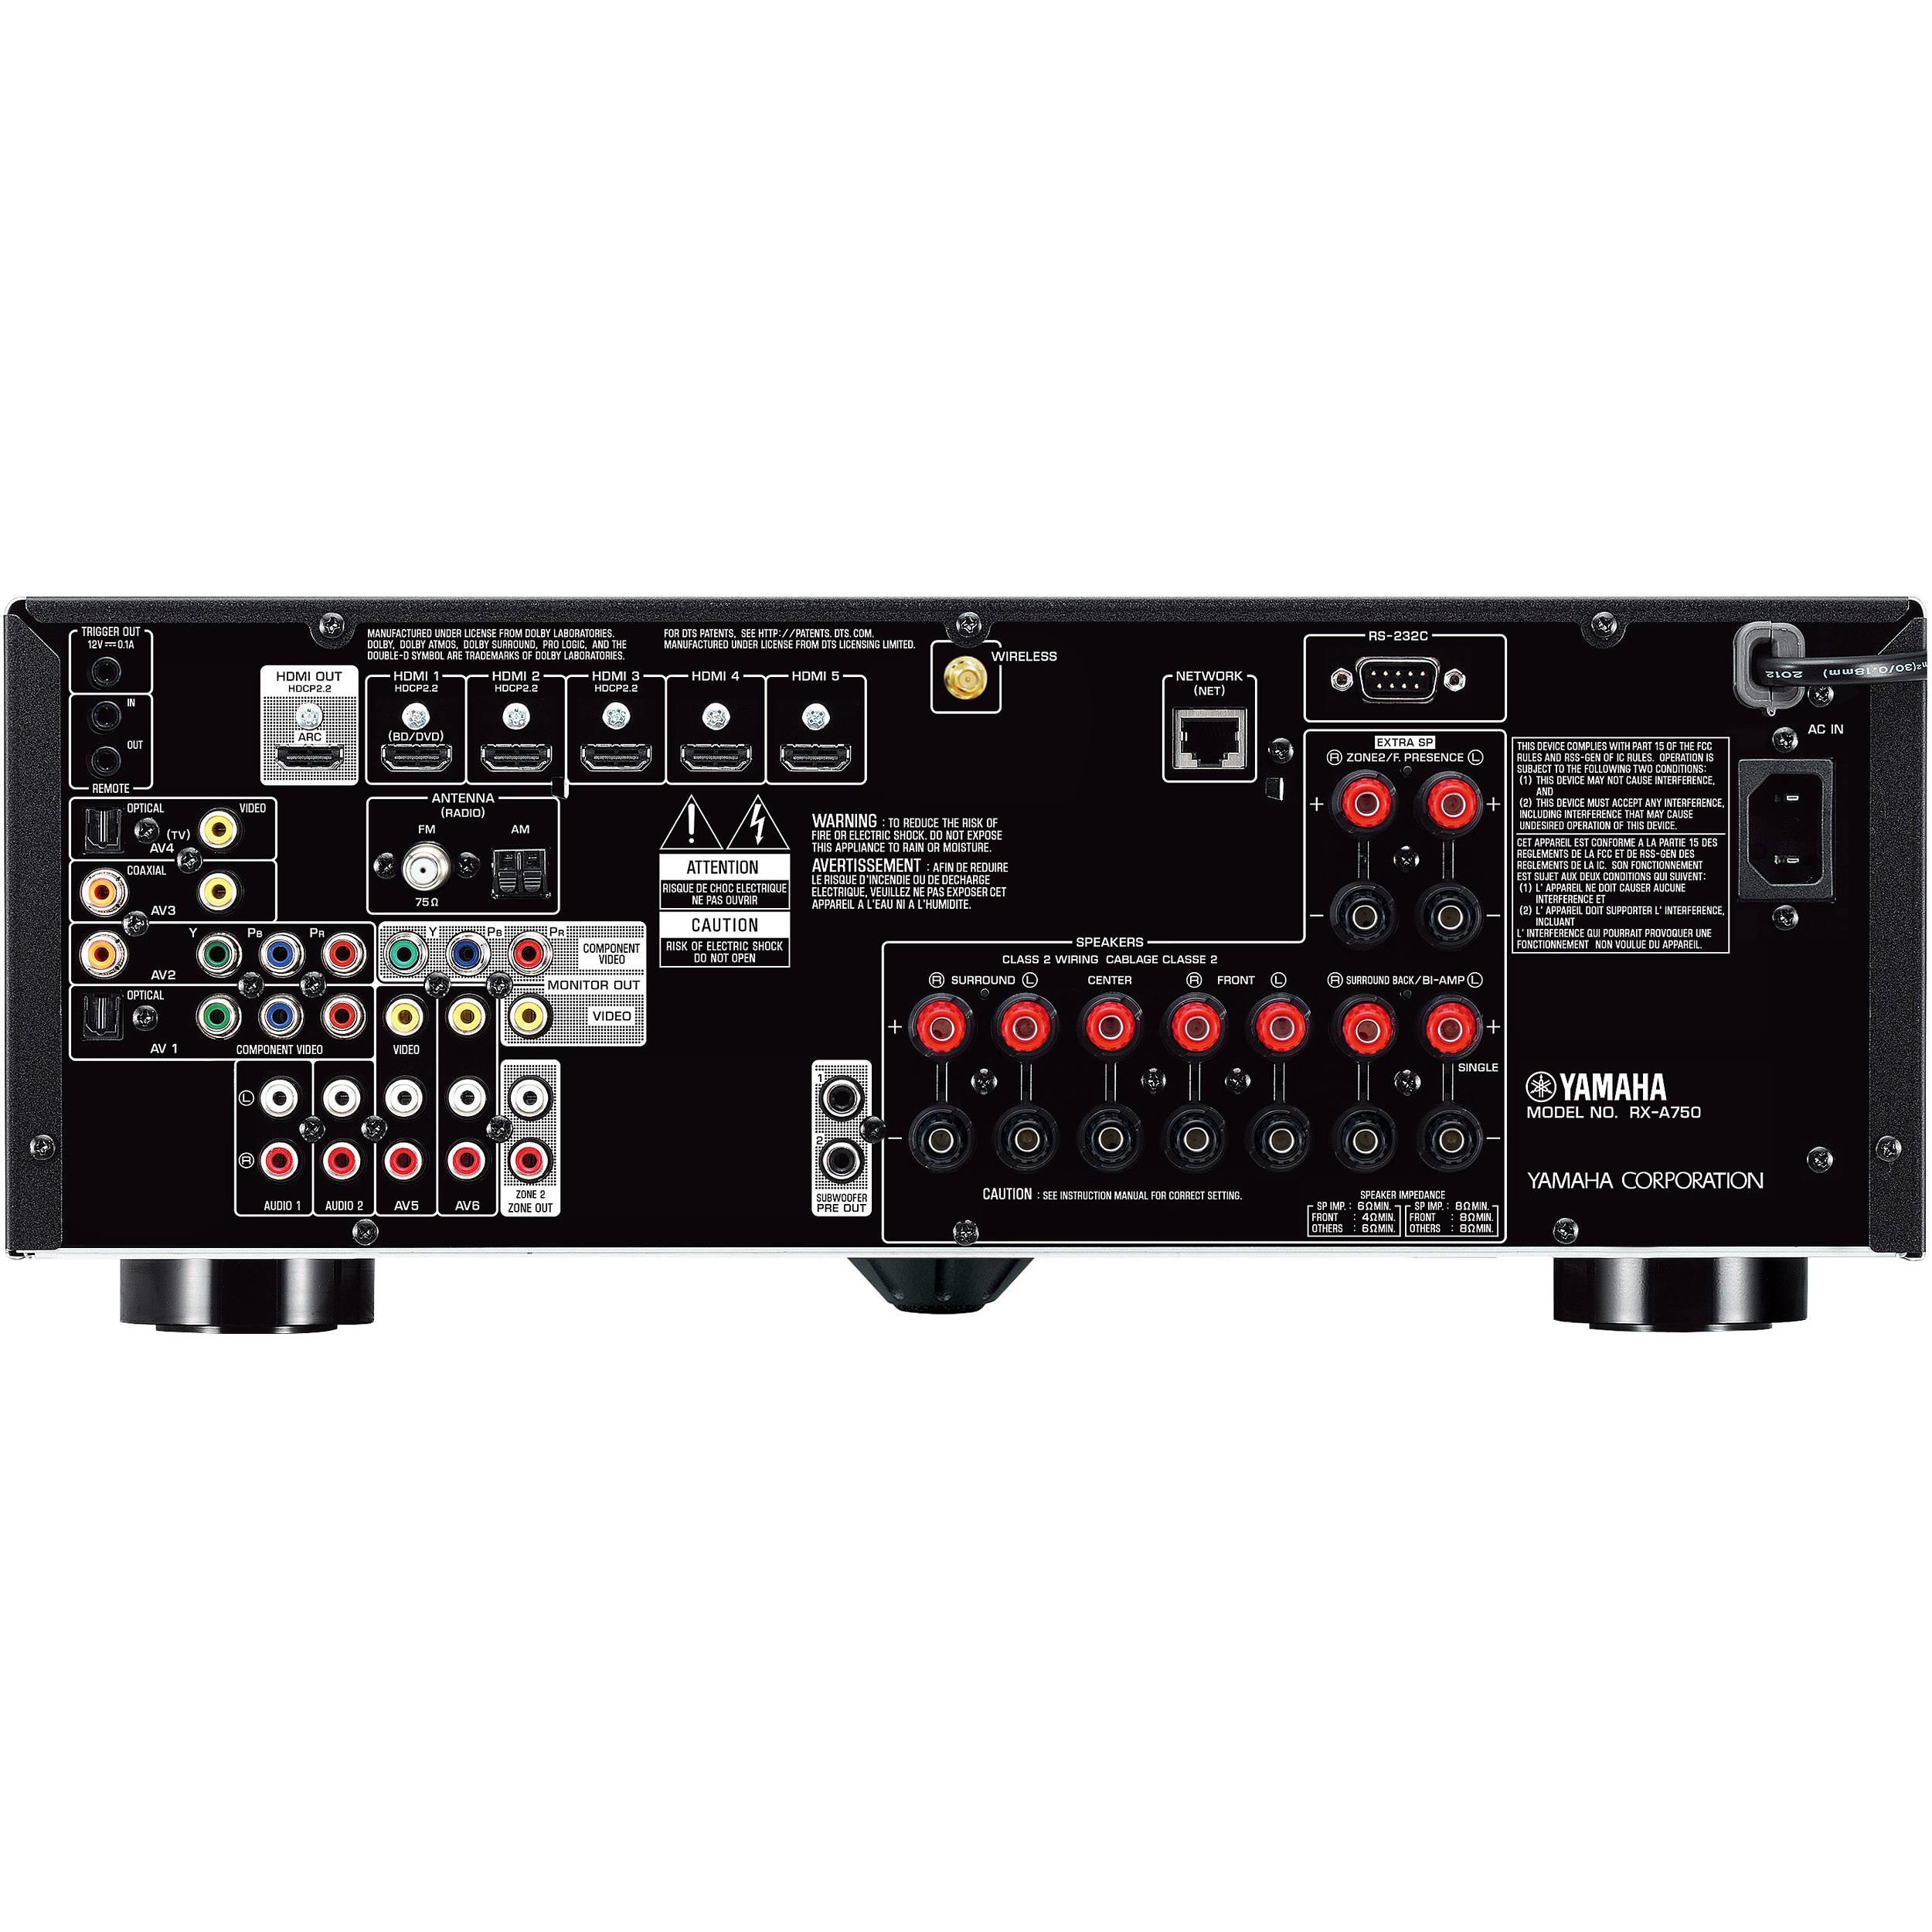 Yamaha AVENTAGE RX-A750BL 7 2-Channel Network AV Receiver (Black)